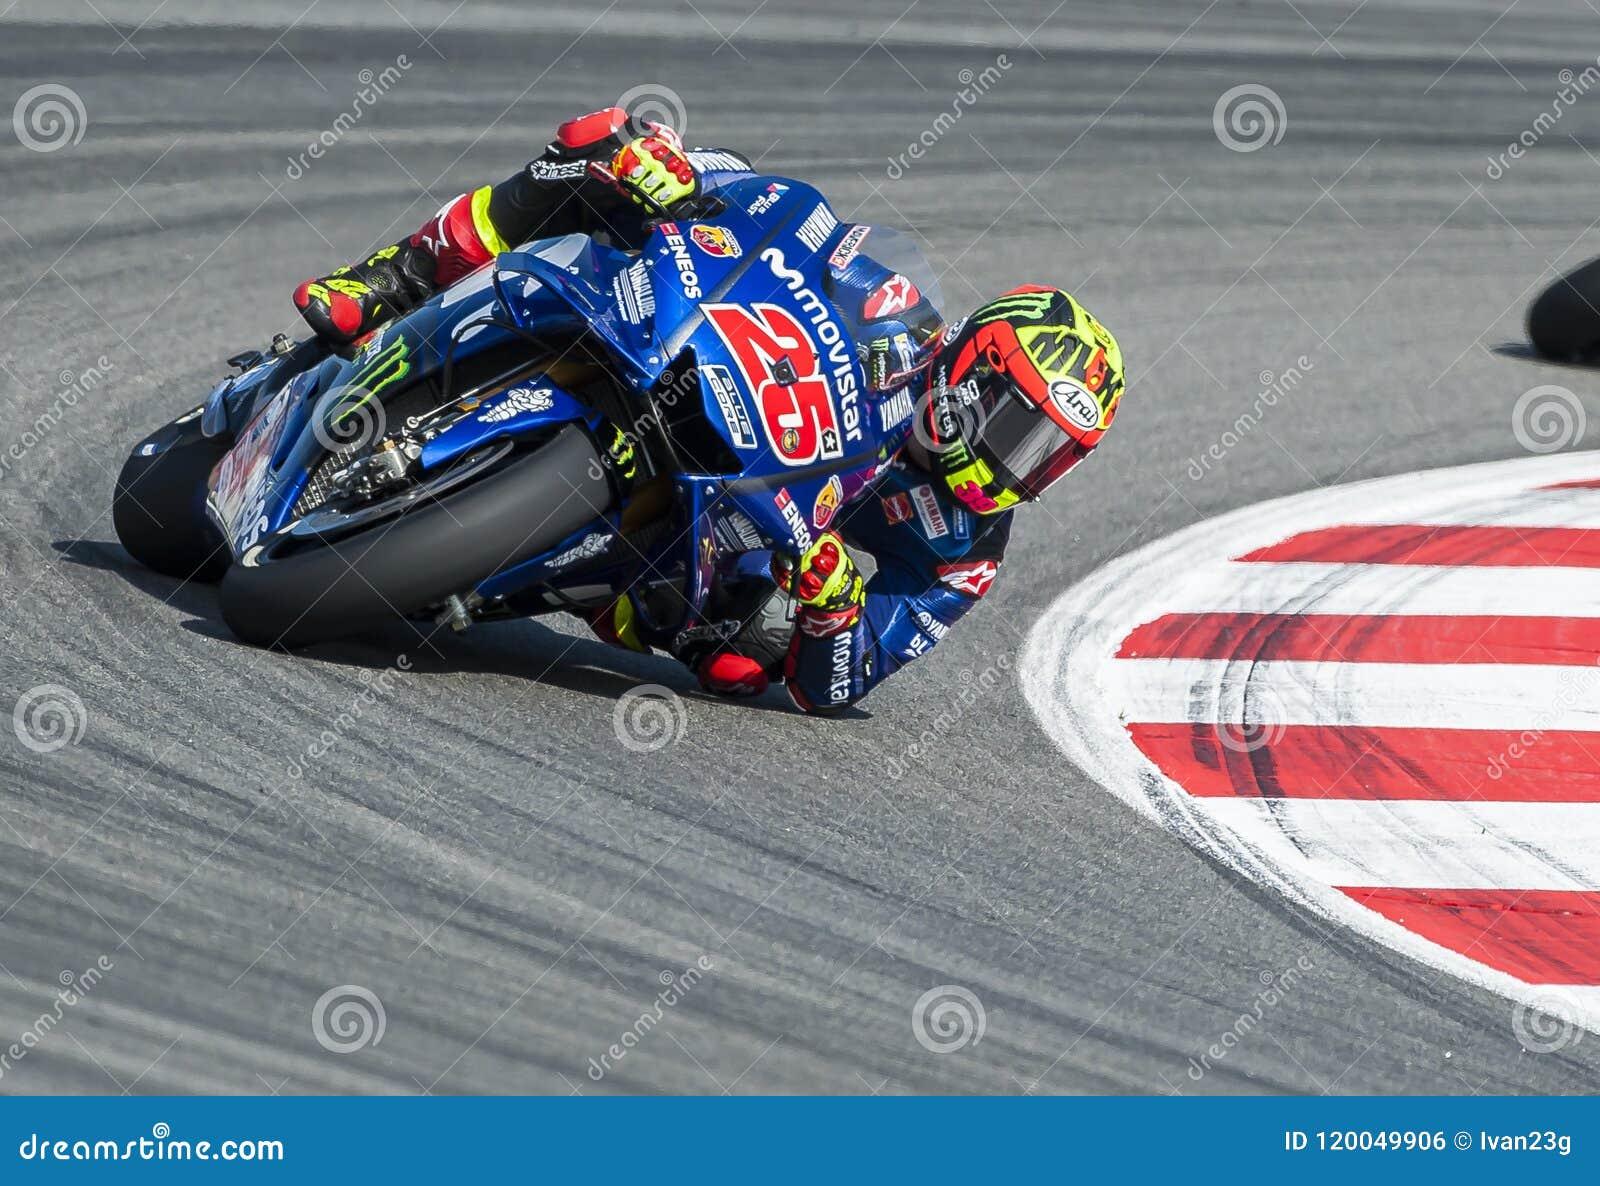 Gp Catalunya Motogp 2018 Editorial Photo Image Of Rider 120049906